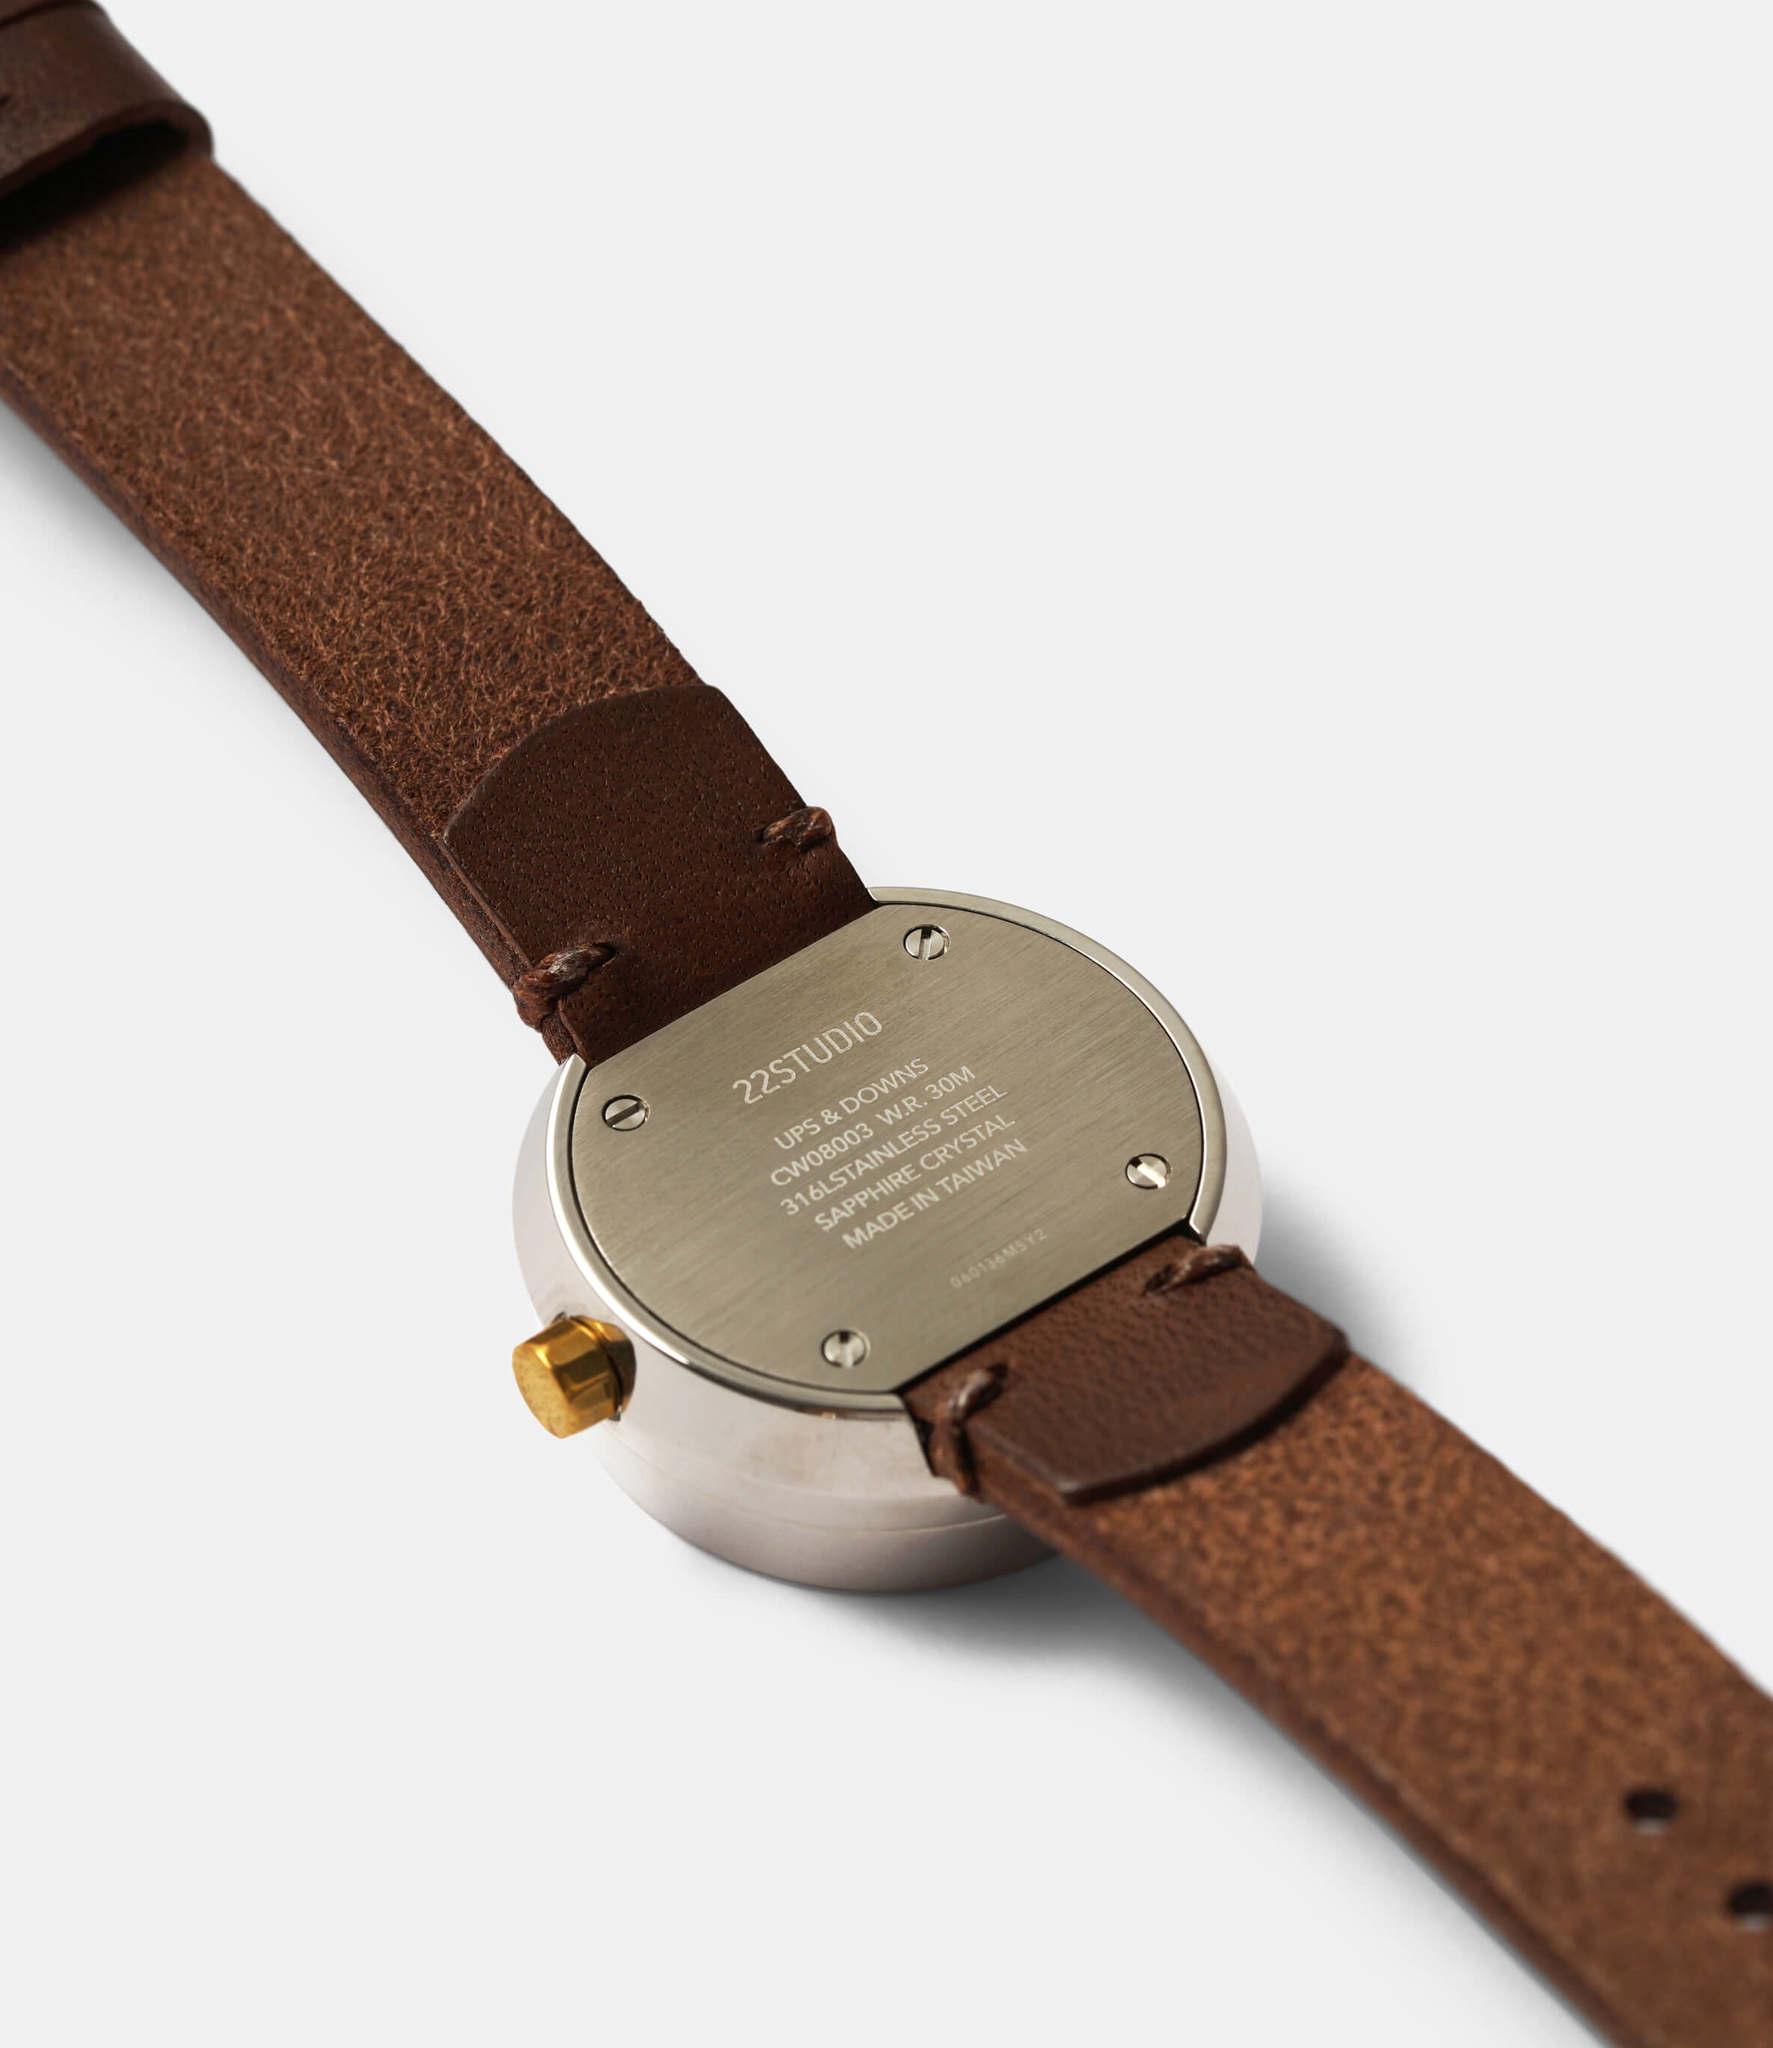 22 Studio Ups & Downs 30mm Mocha — часы из бетона